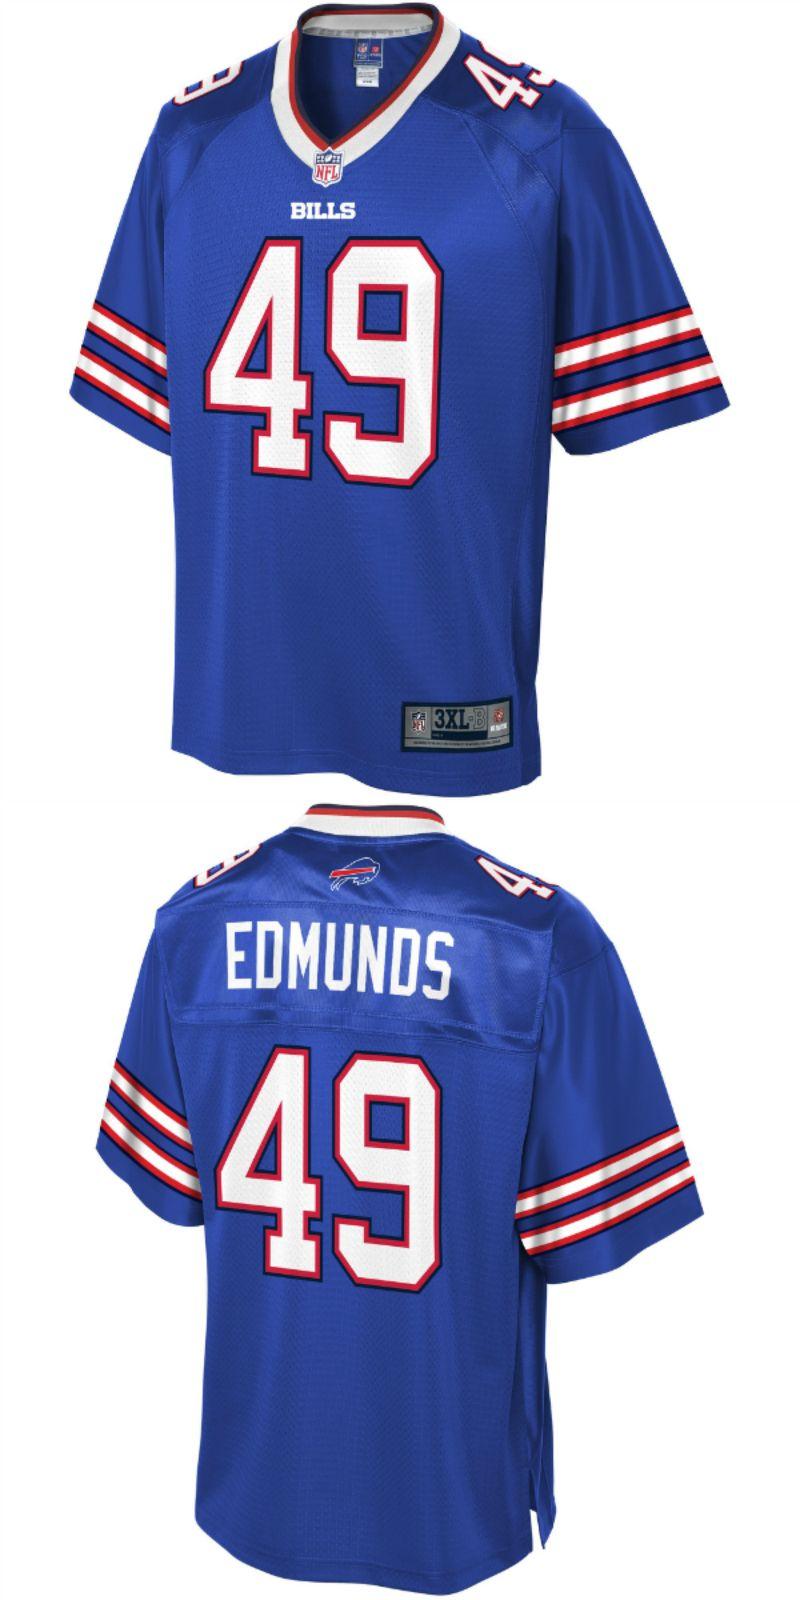 outlet store 08422 cdefb Tremaine Edmunds Buffalo Bills NFL Pro Line Big & Tall ...